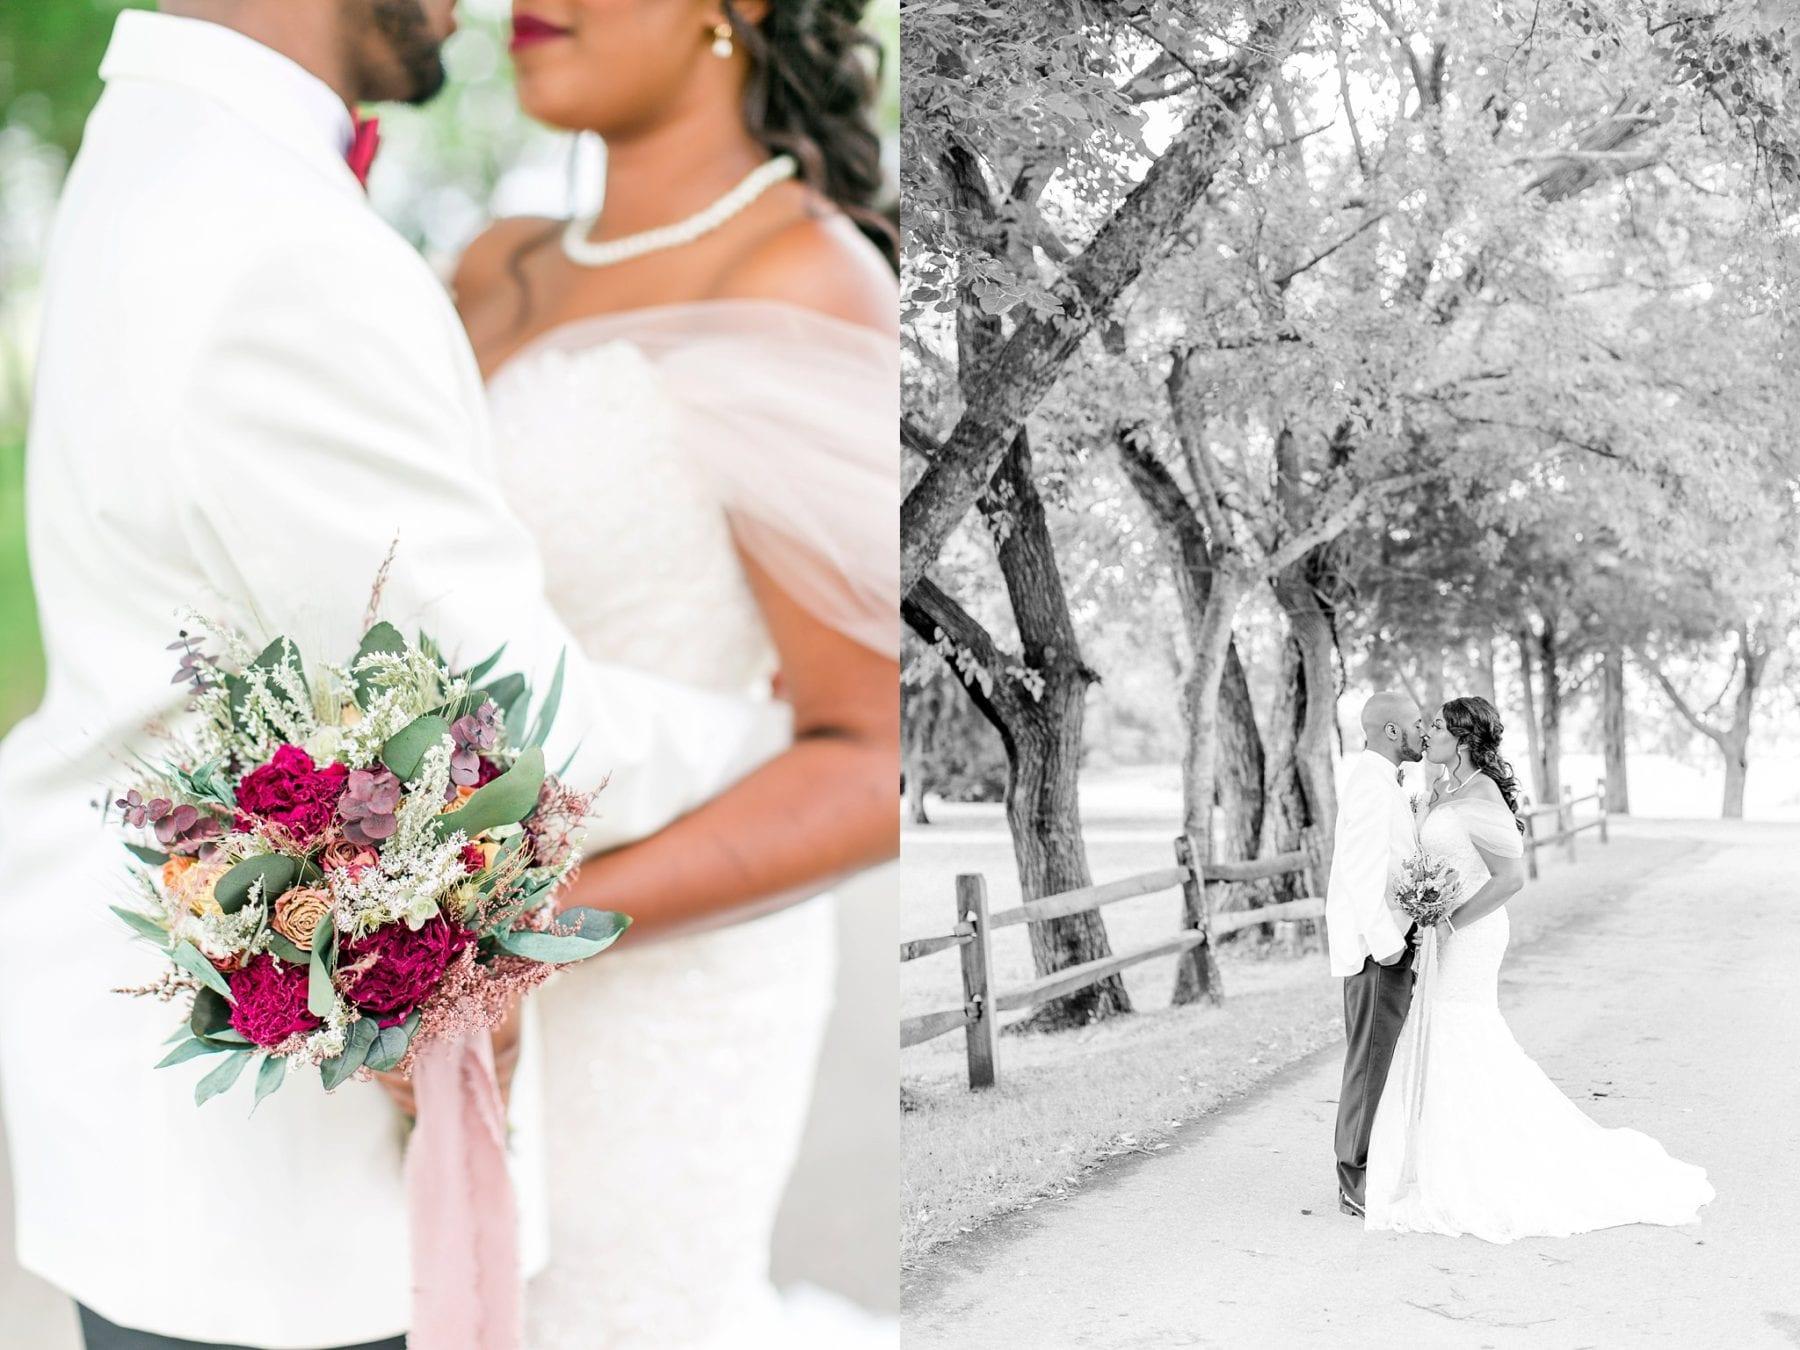 Jefferson Patterson Park Wedding Maryland Wedding Photographer Megan Kelsey Photography Jasmine & Seyi-42.jpg